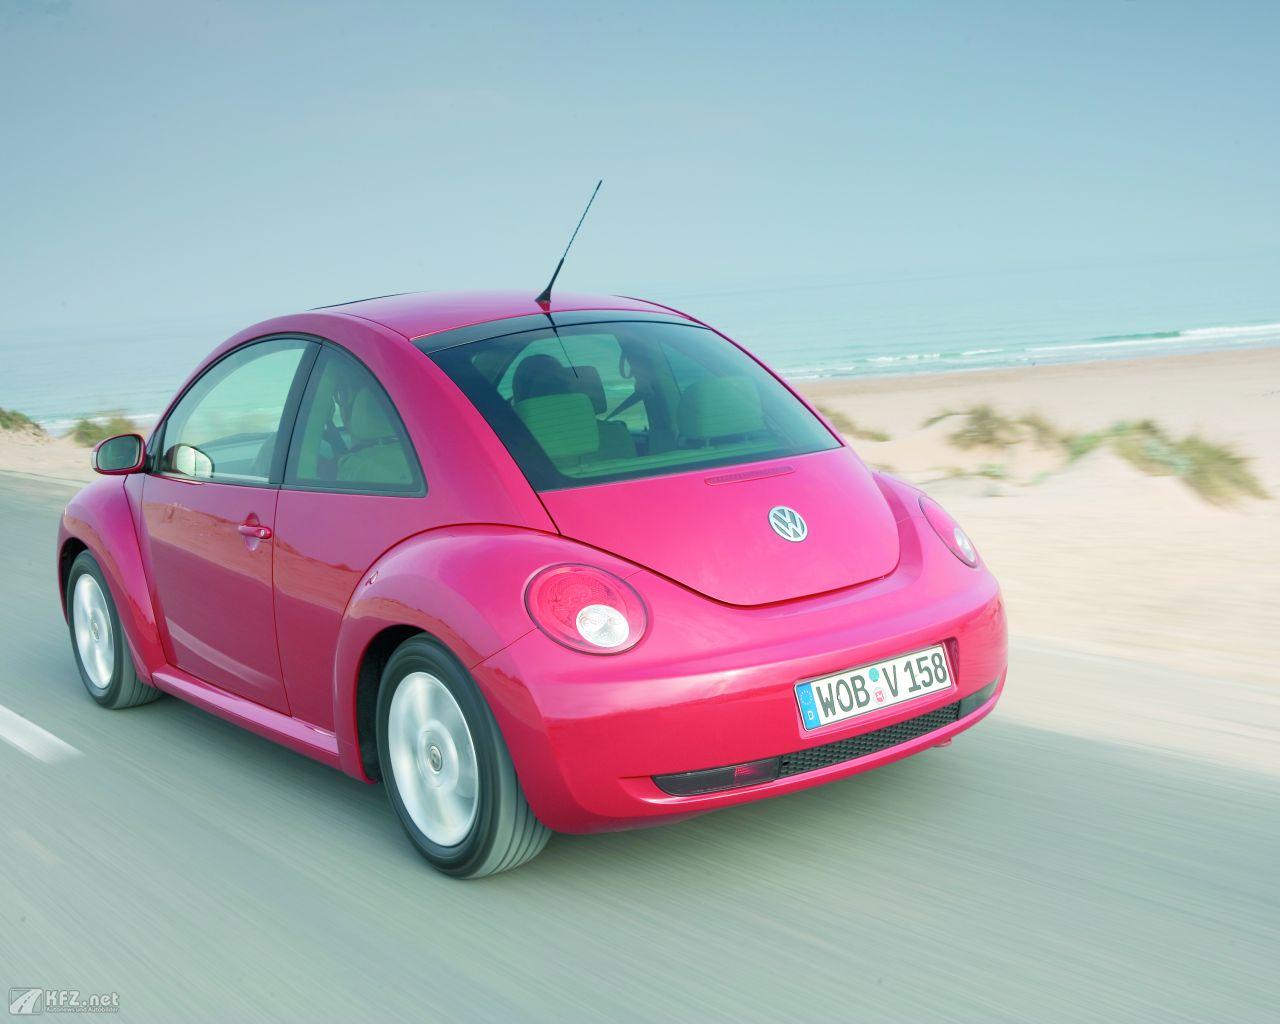 vw-beetle-1280x1024-8